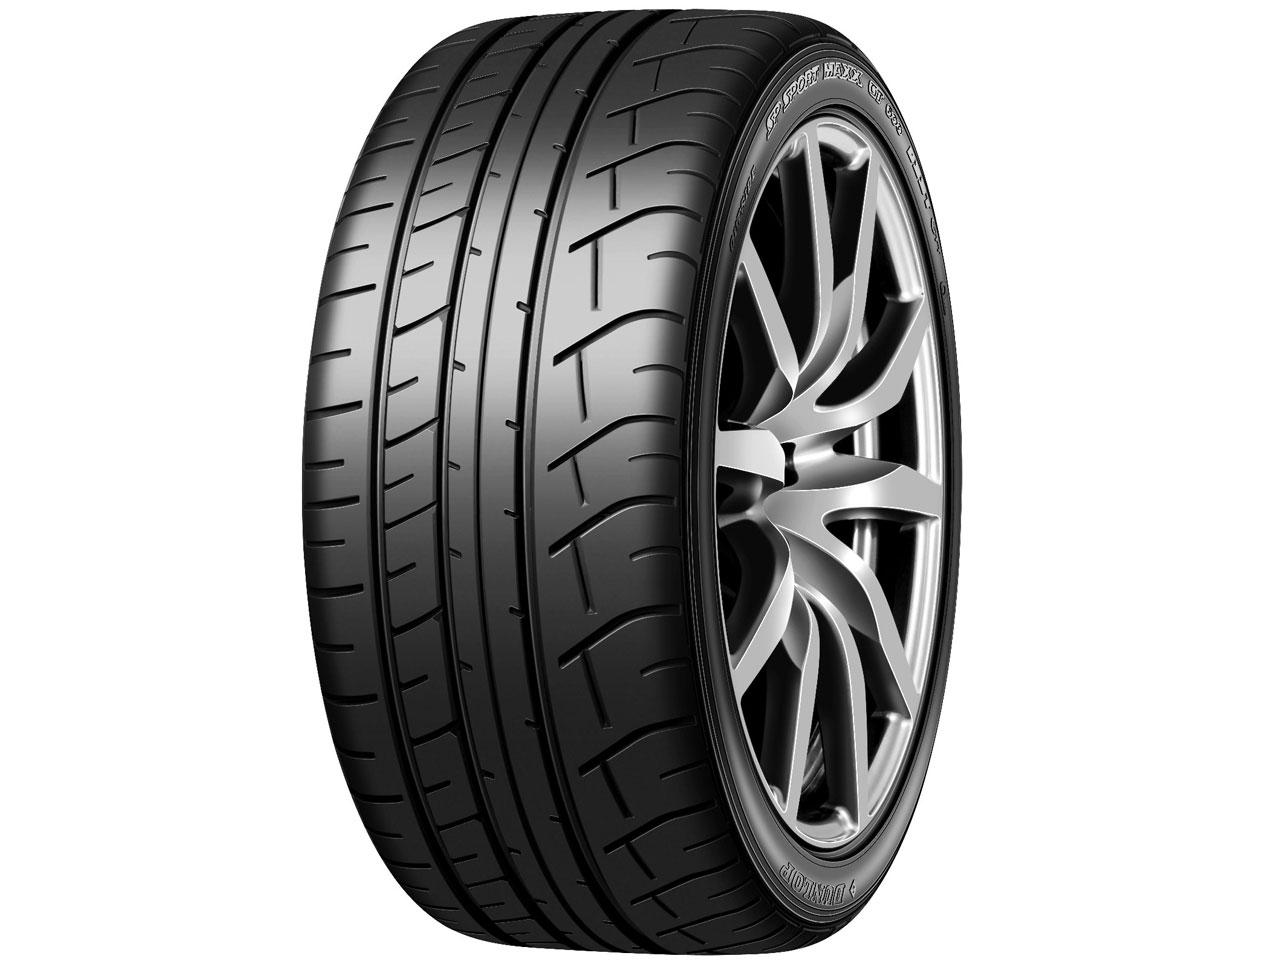 285/35R20 104Y   , Dunlop, SPORT MAXX GT 600 DSST